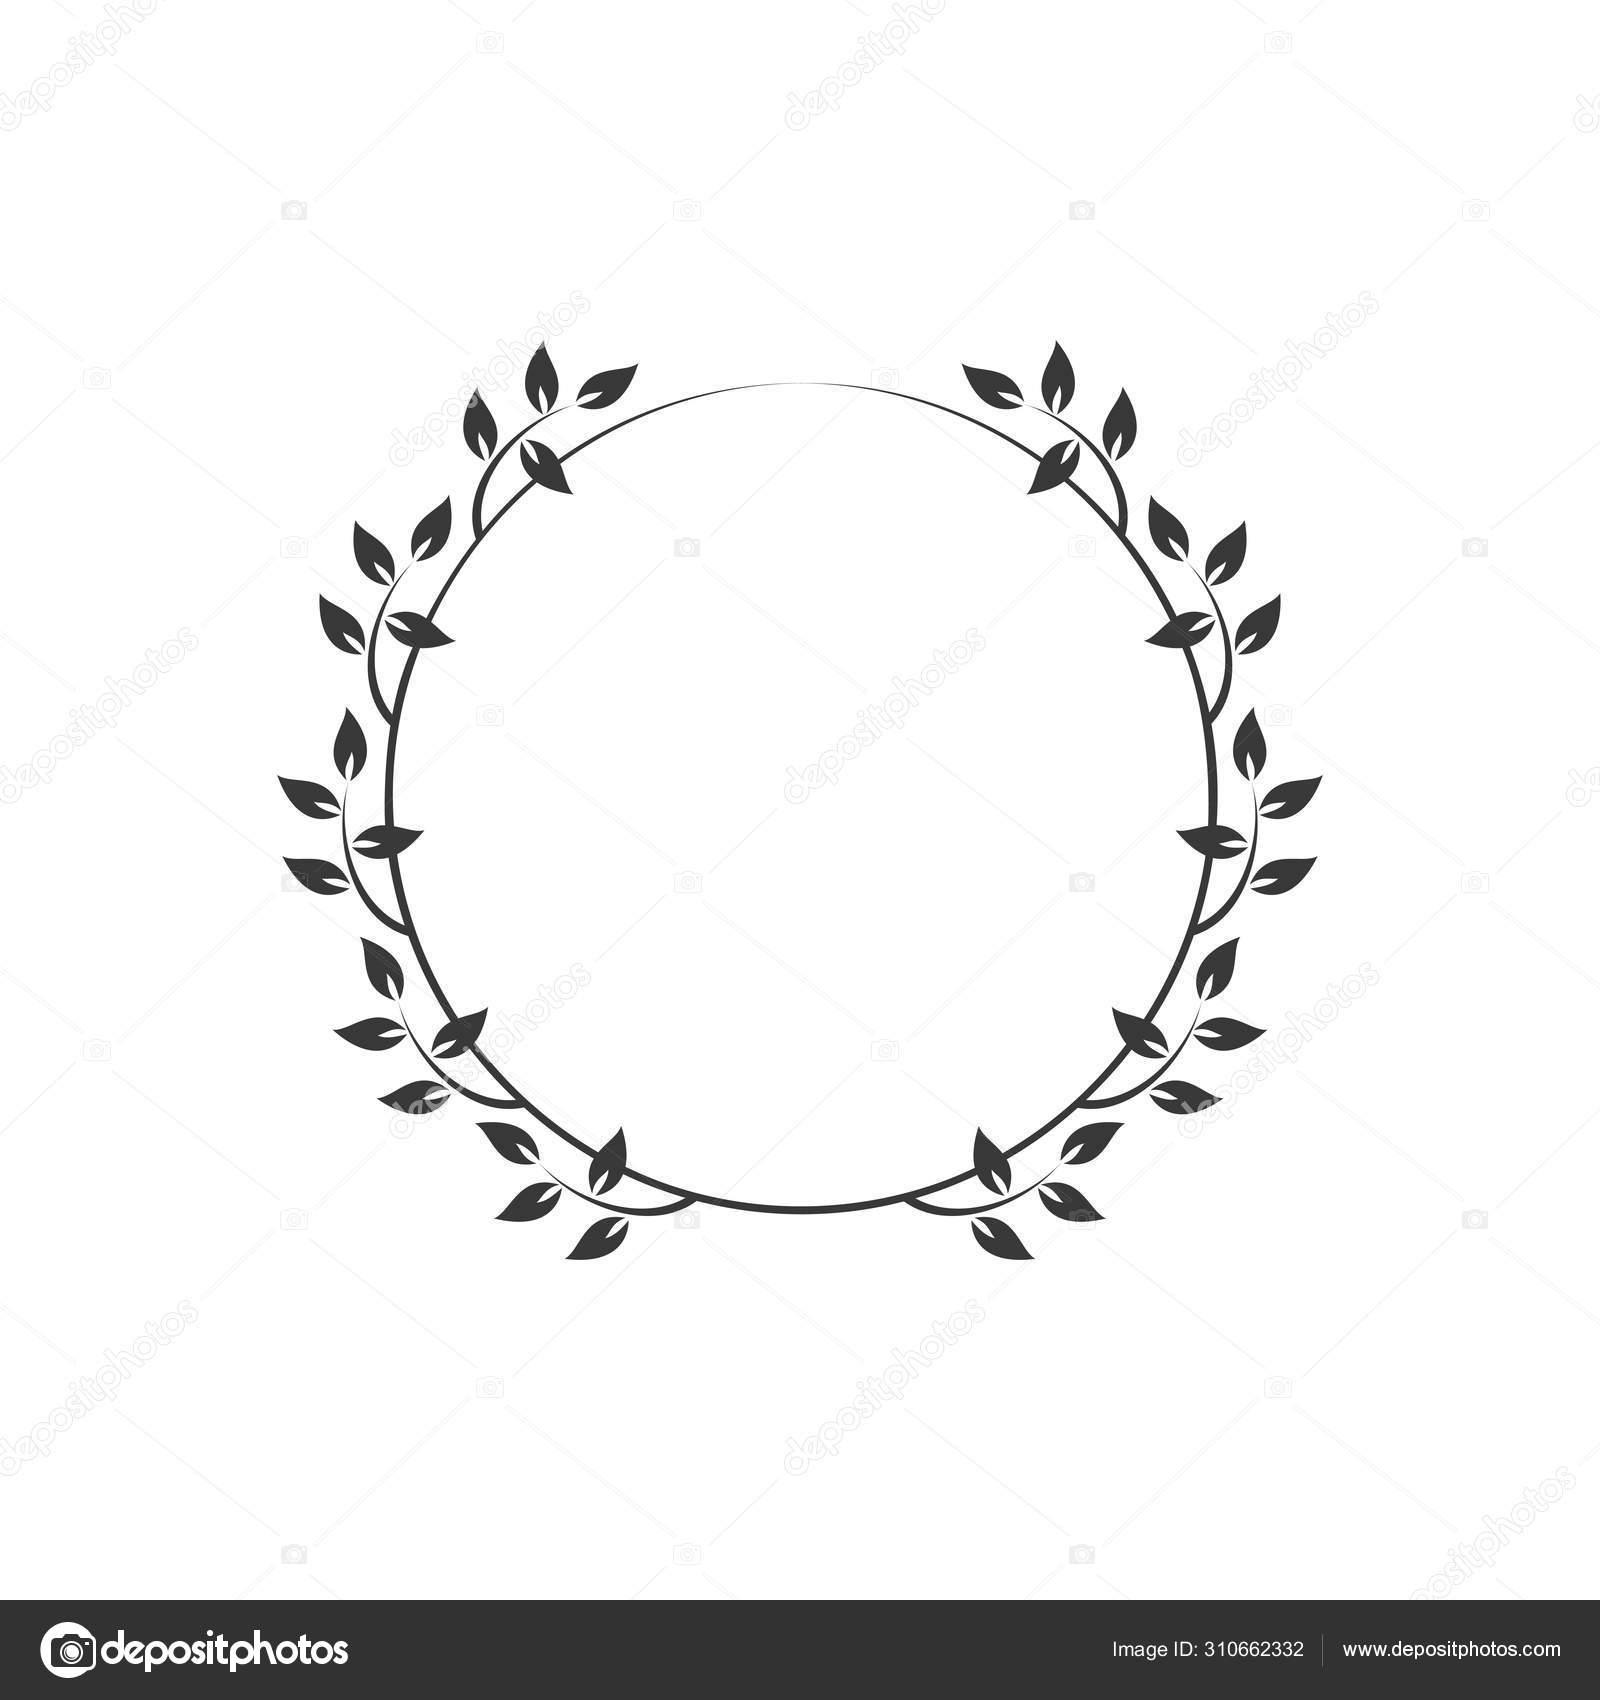 Vintage Floral Frames Black Decorative Circular Ivy Wreath Vector Illustration Vector Image By C Imaagio Vector Stock 310662332